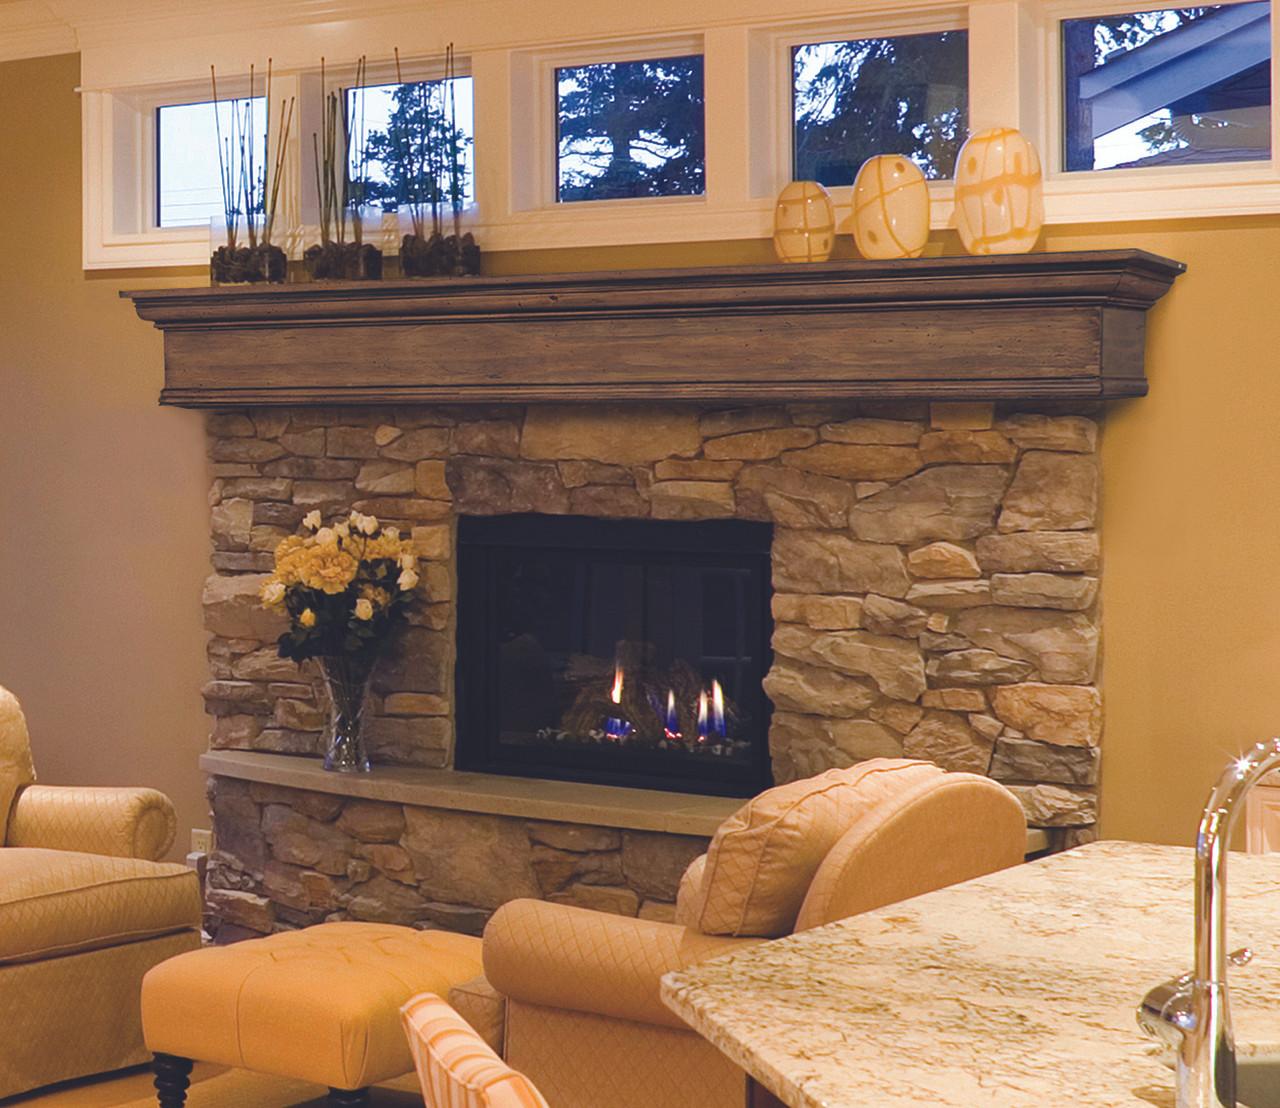 The Savannah Fireplace Mantel Shelf